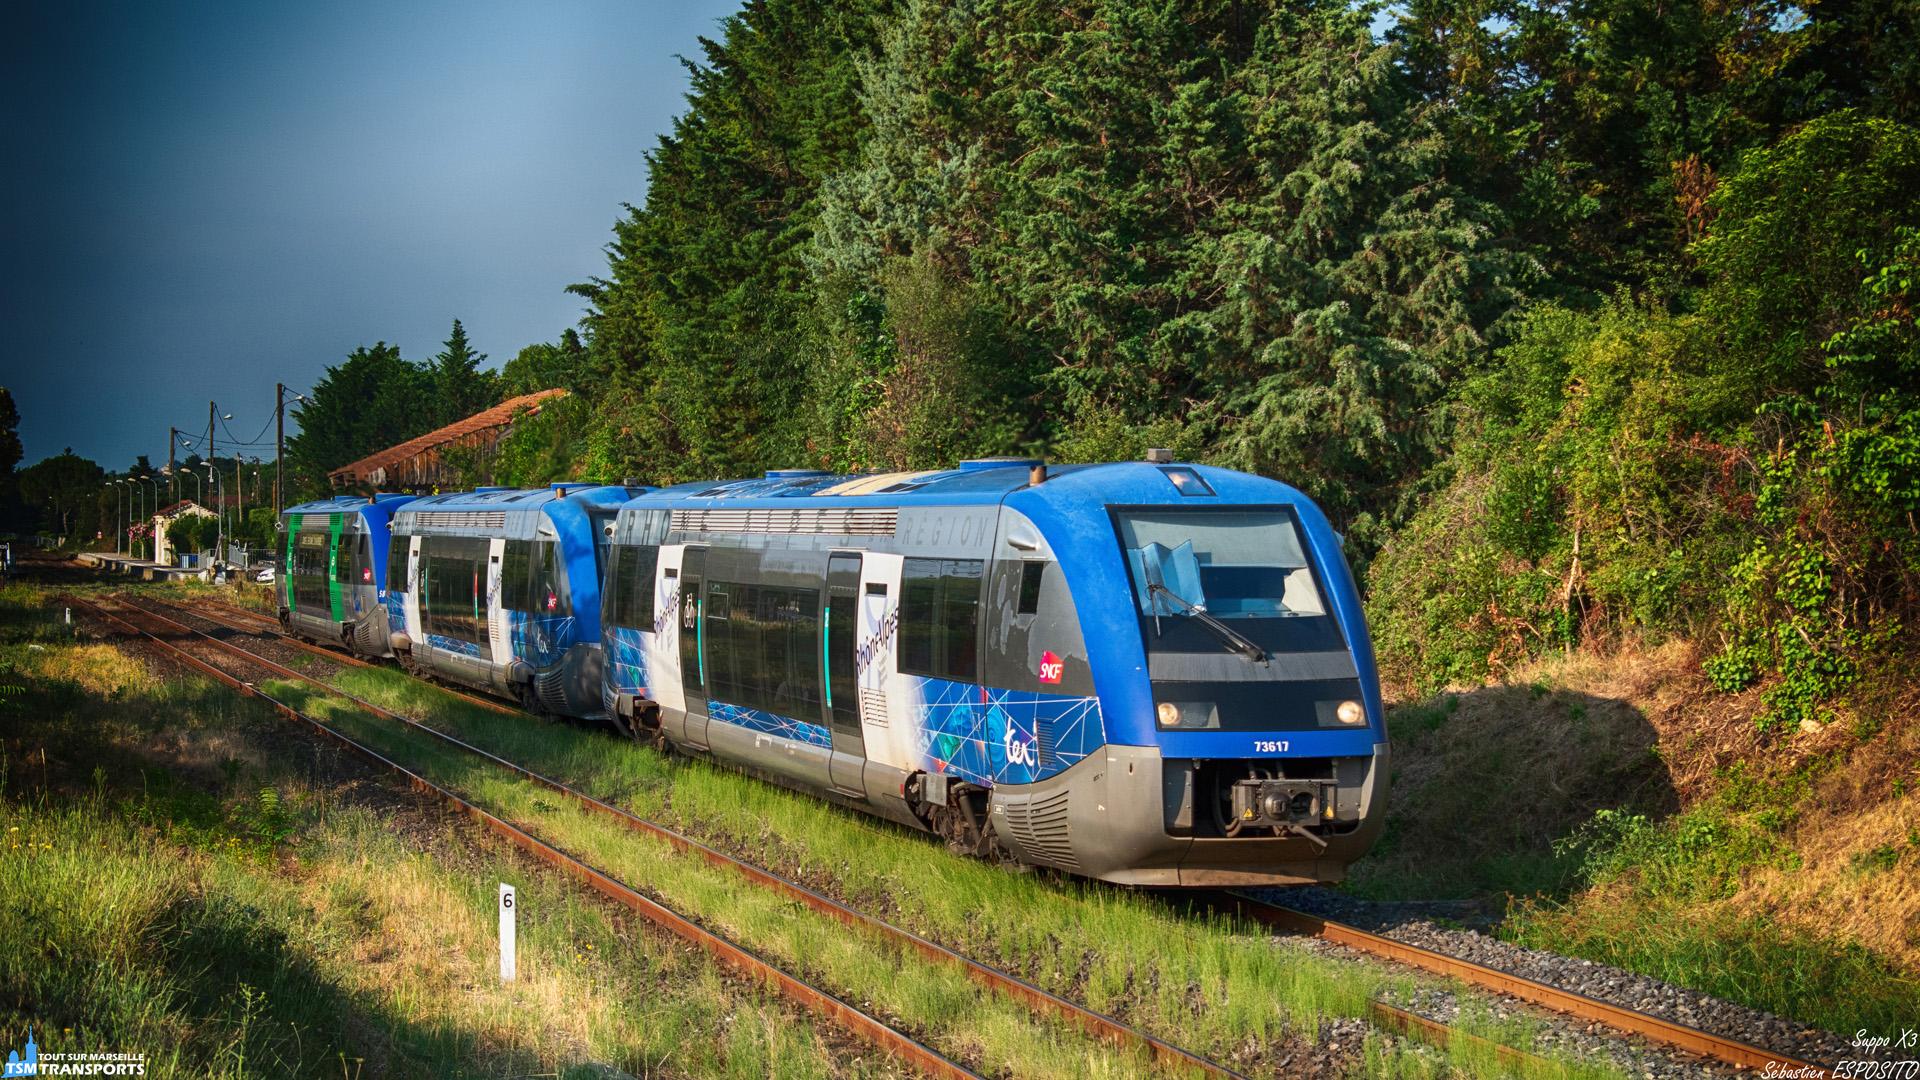 Alstom X73500